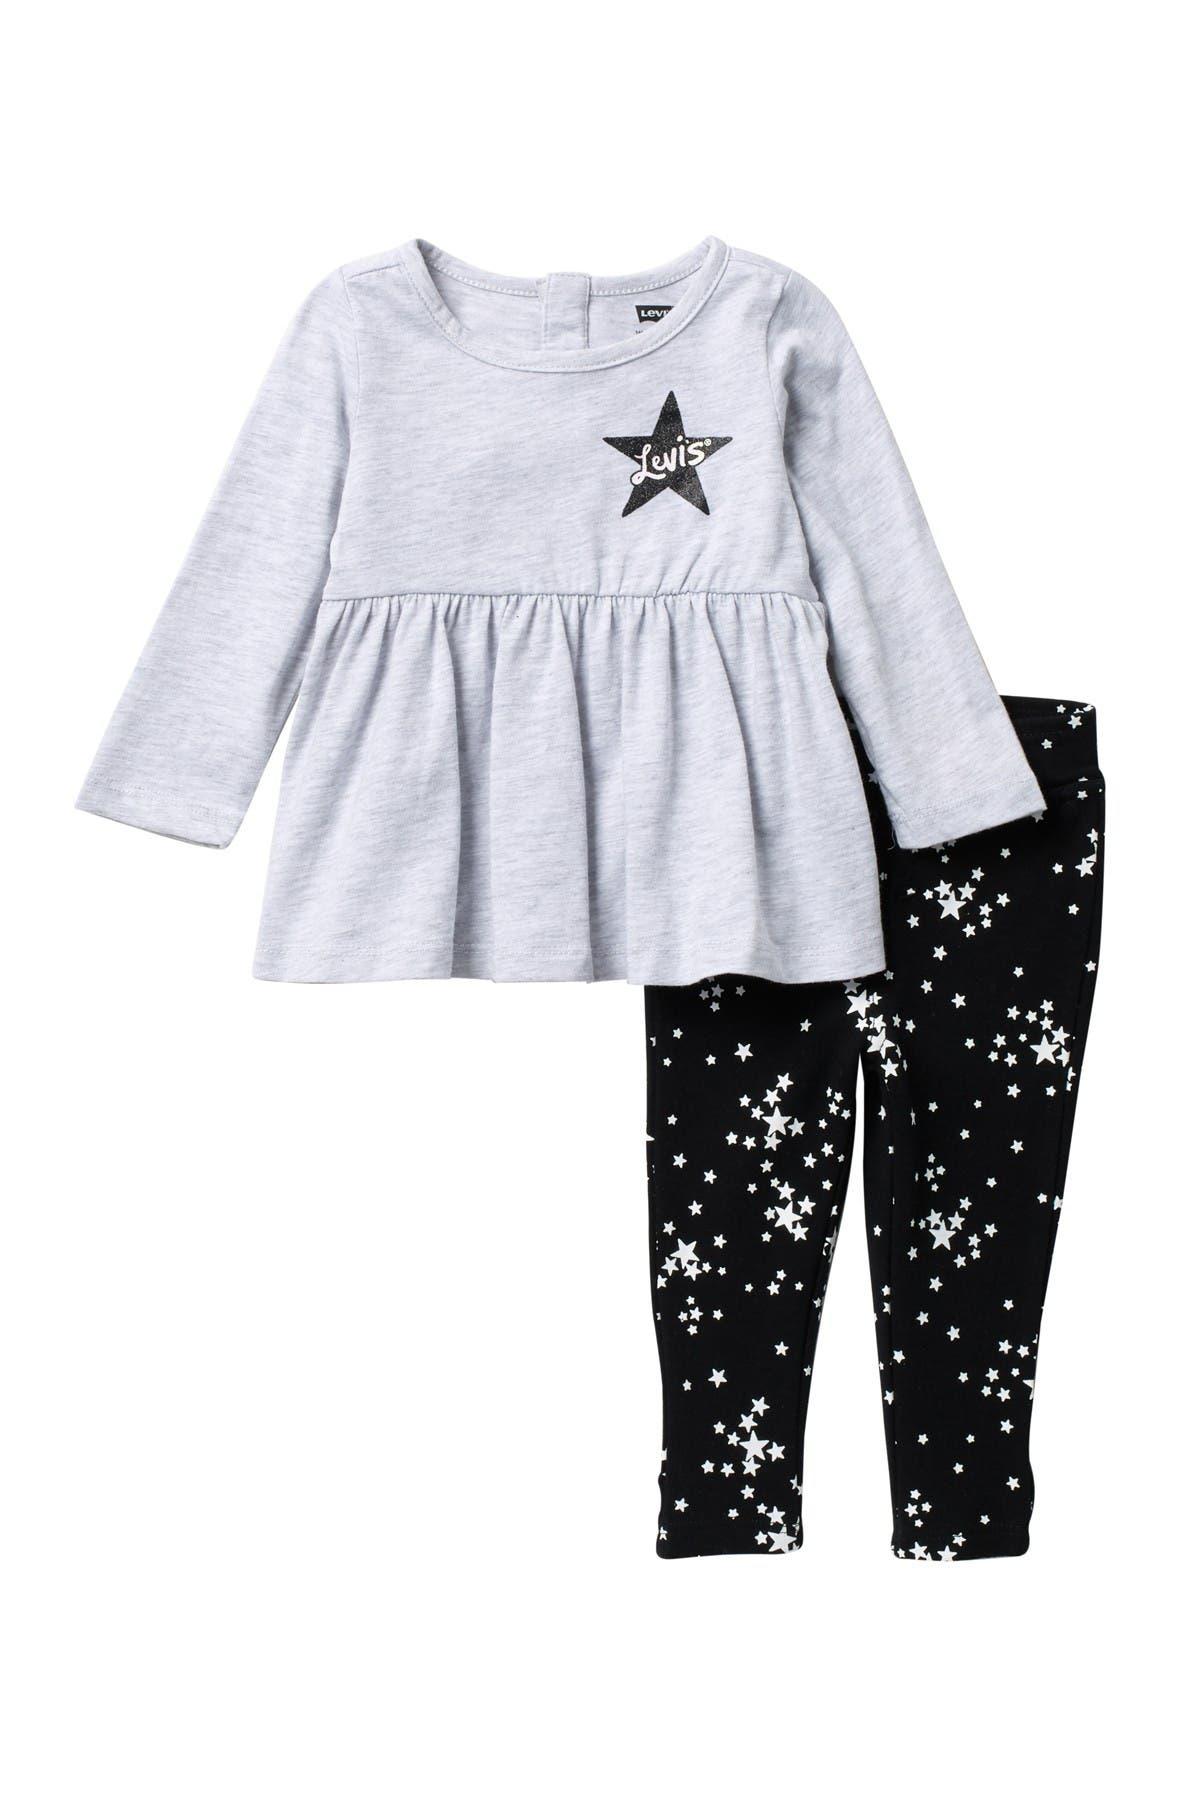 Image of Levi's Star Knit Tunic Top & Leggings Set